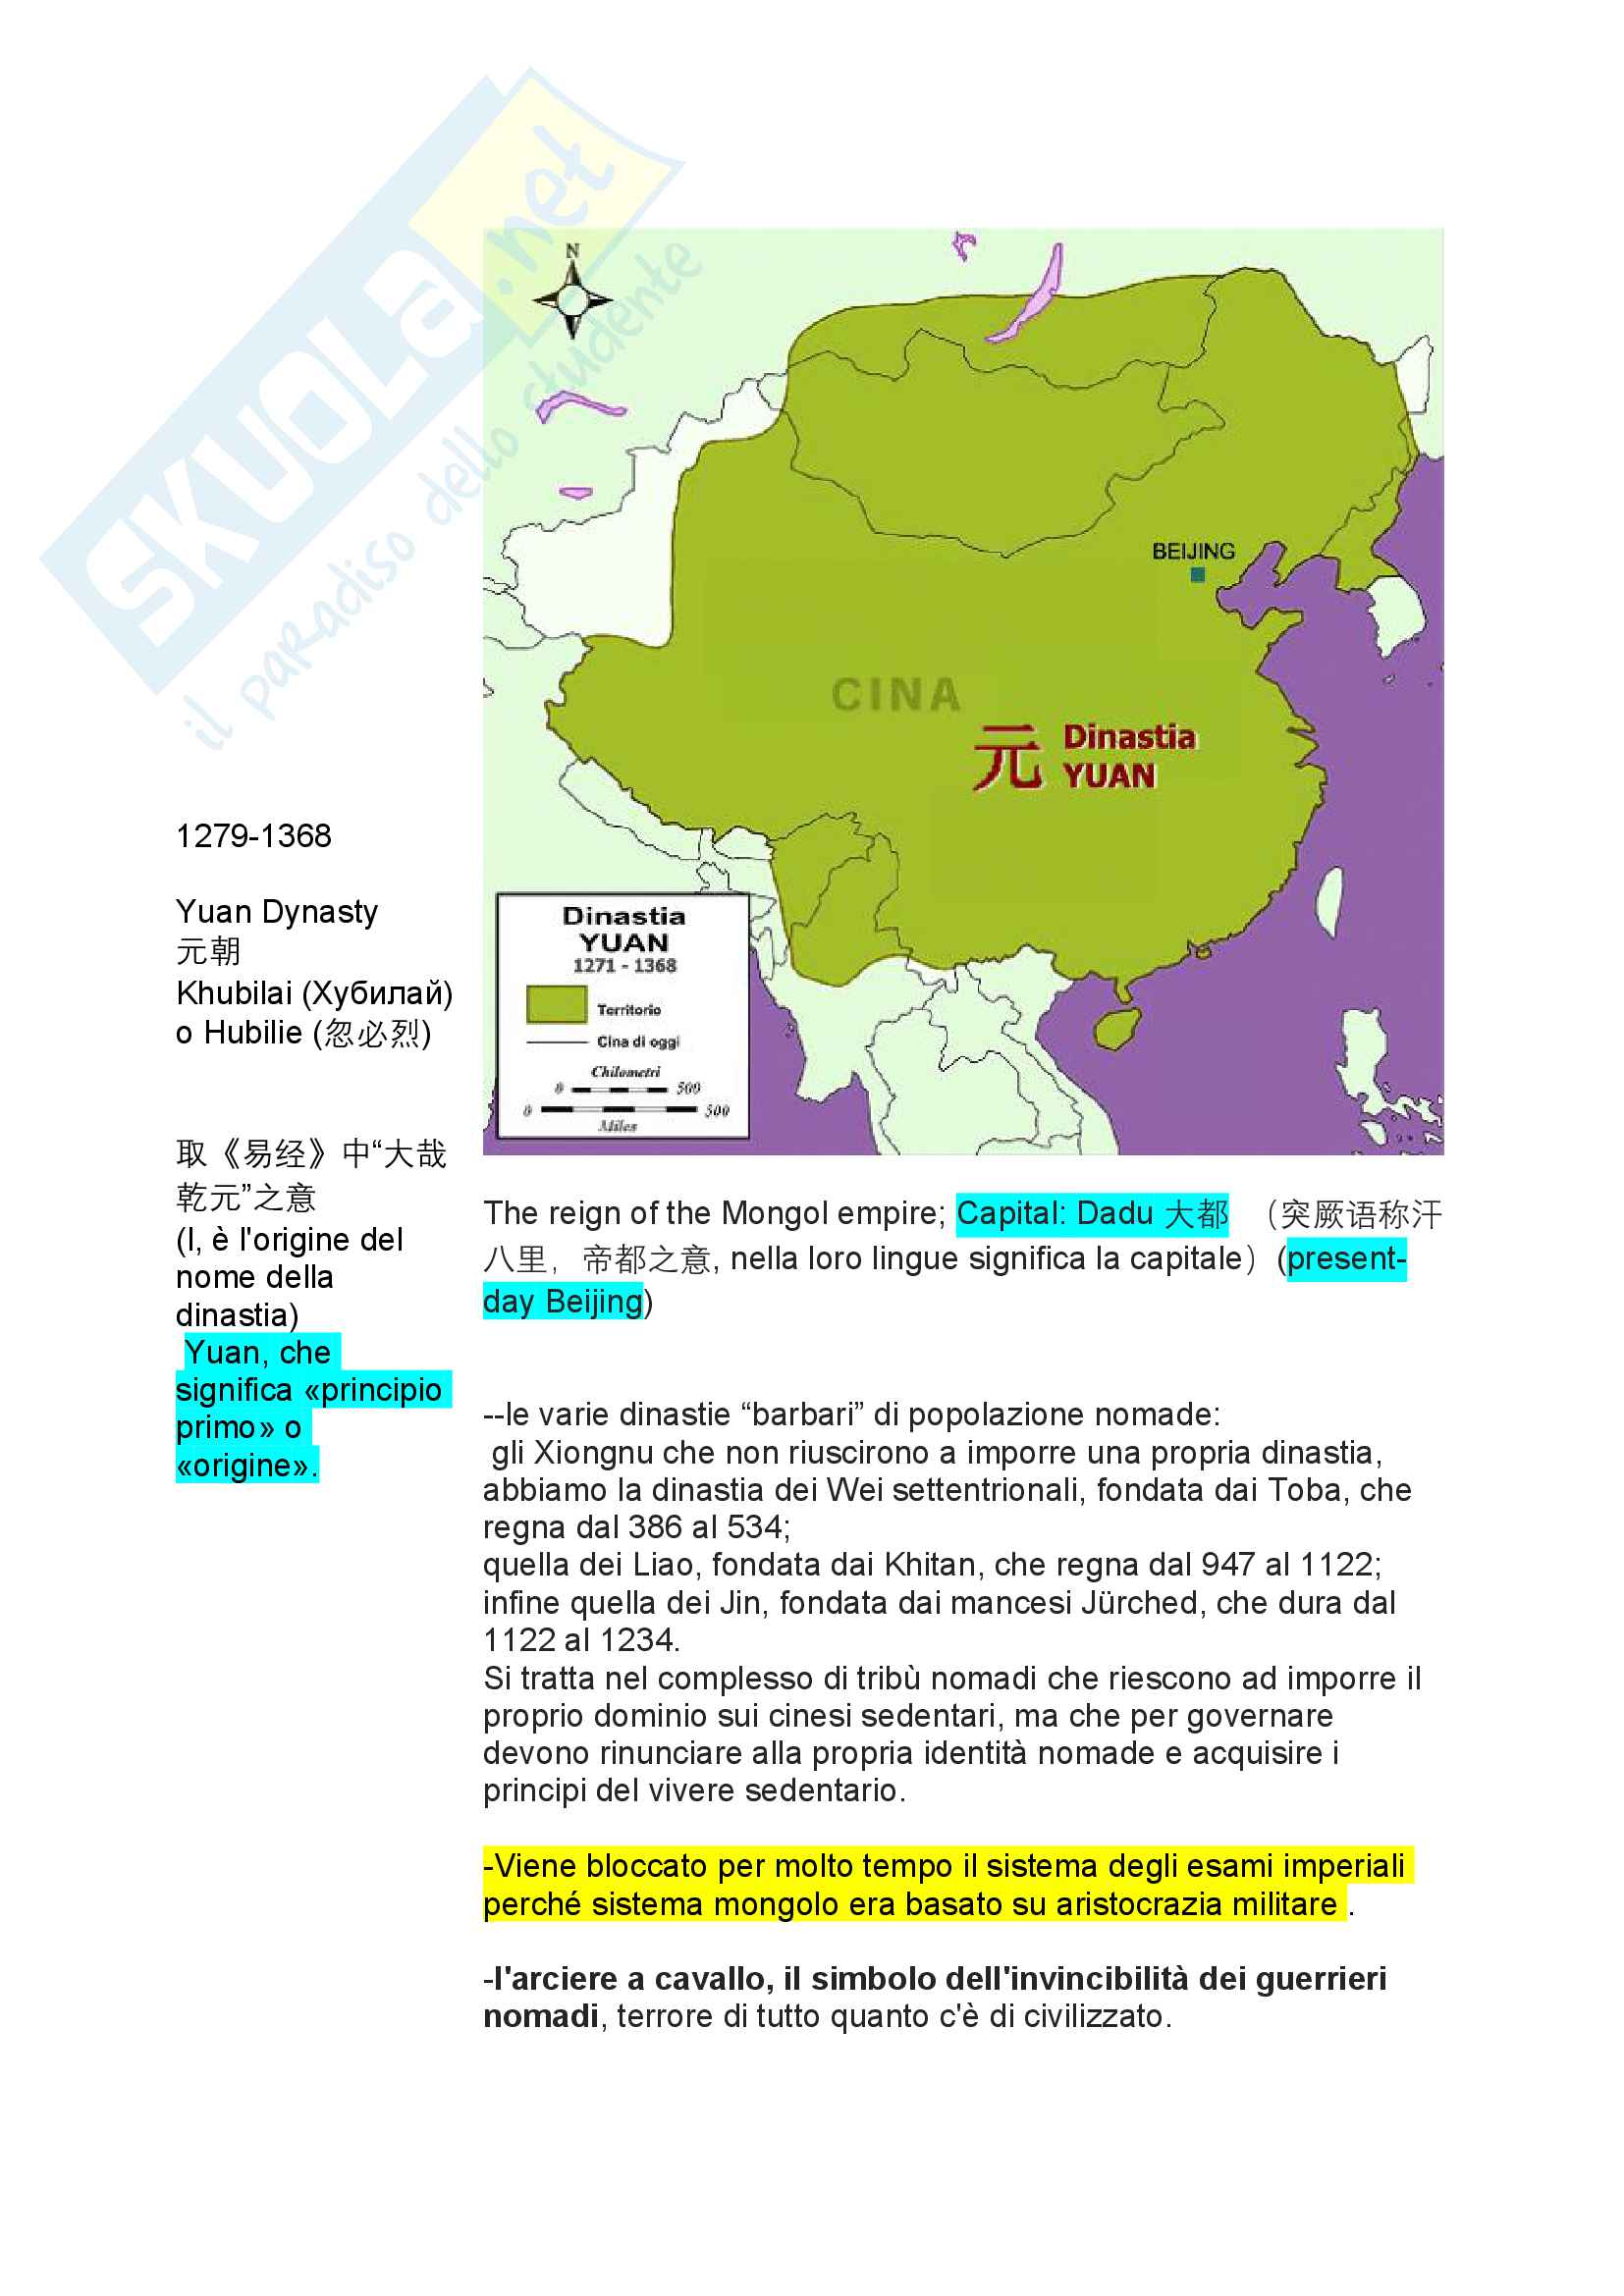 Storia cinese 1 ca foscari Pag. 31